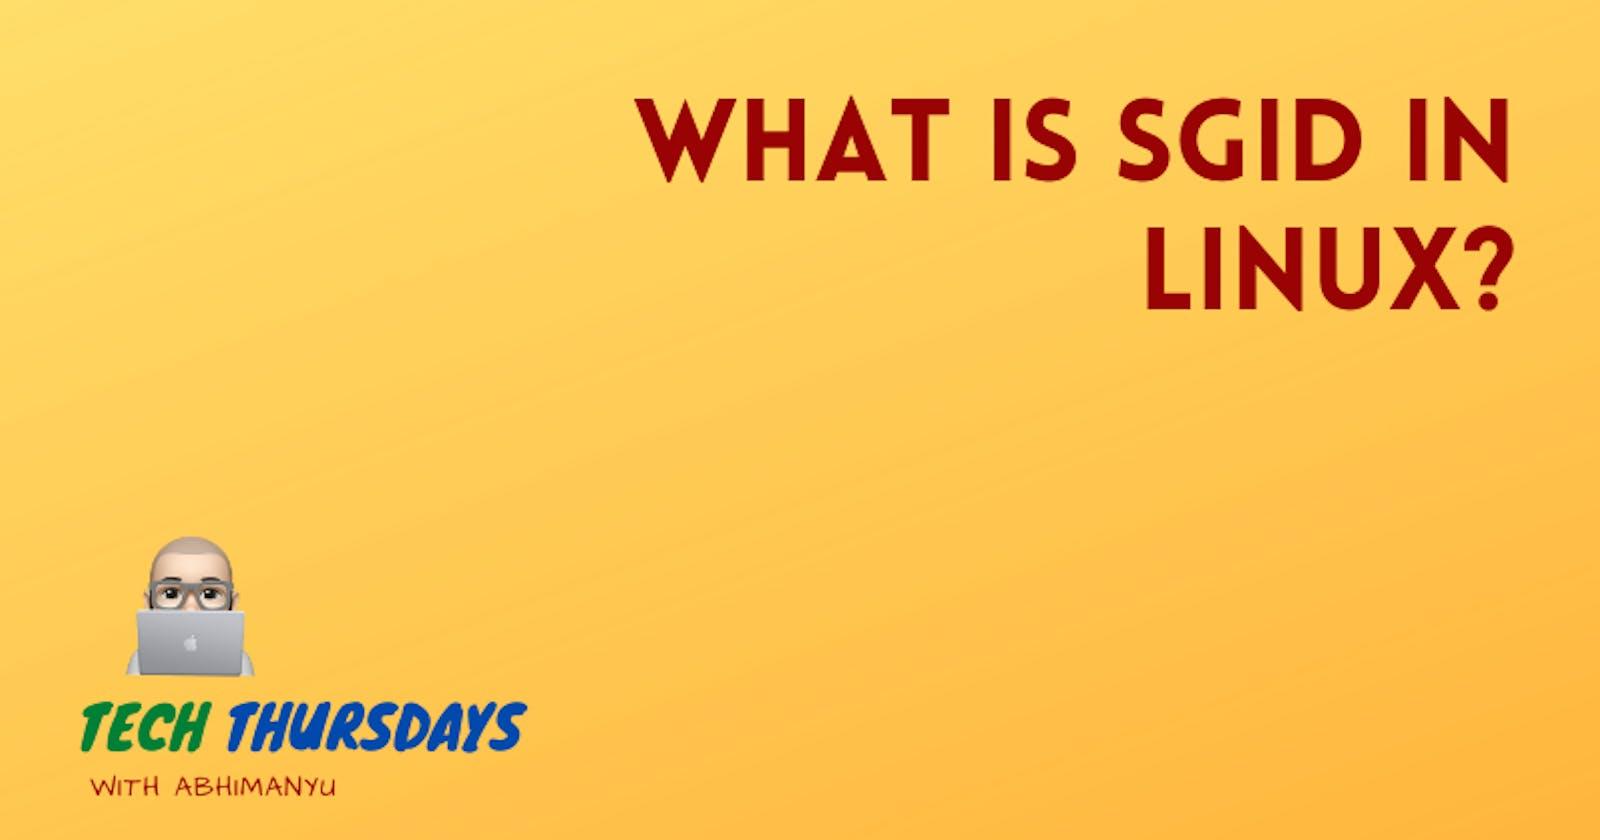 What is SGID in Linux?